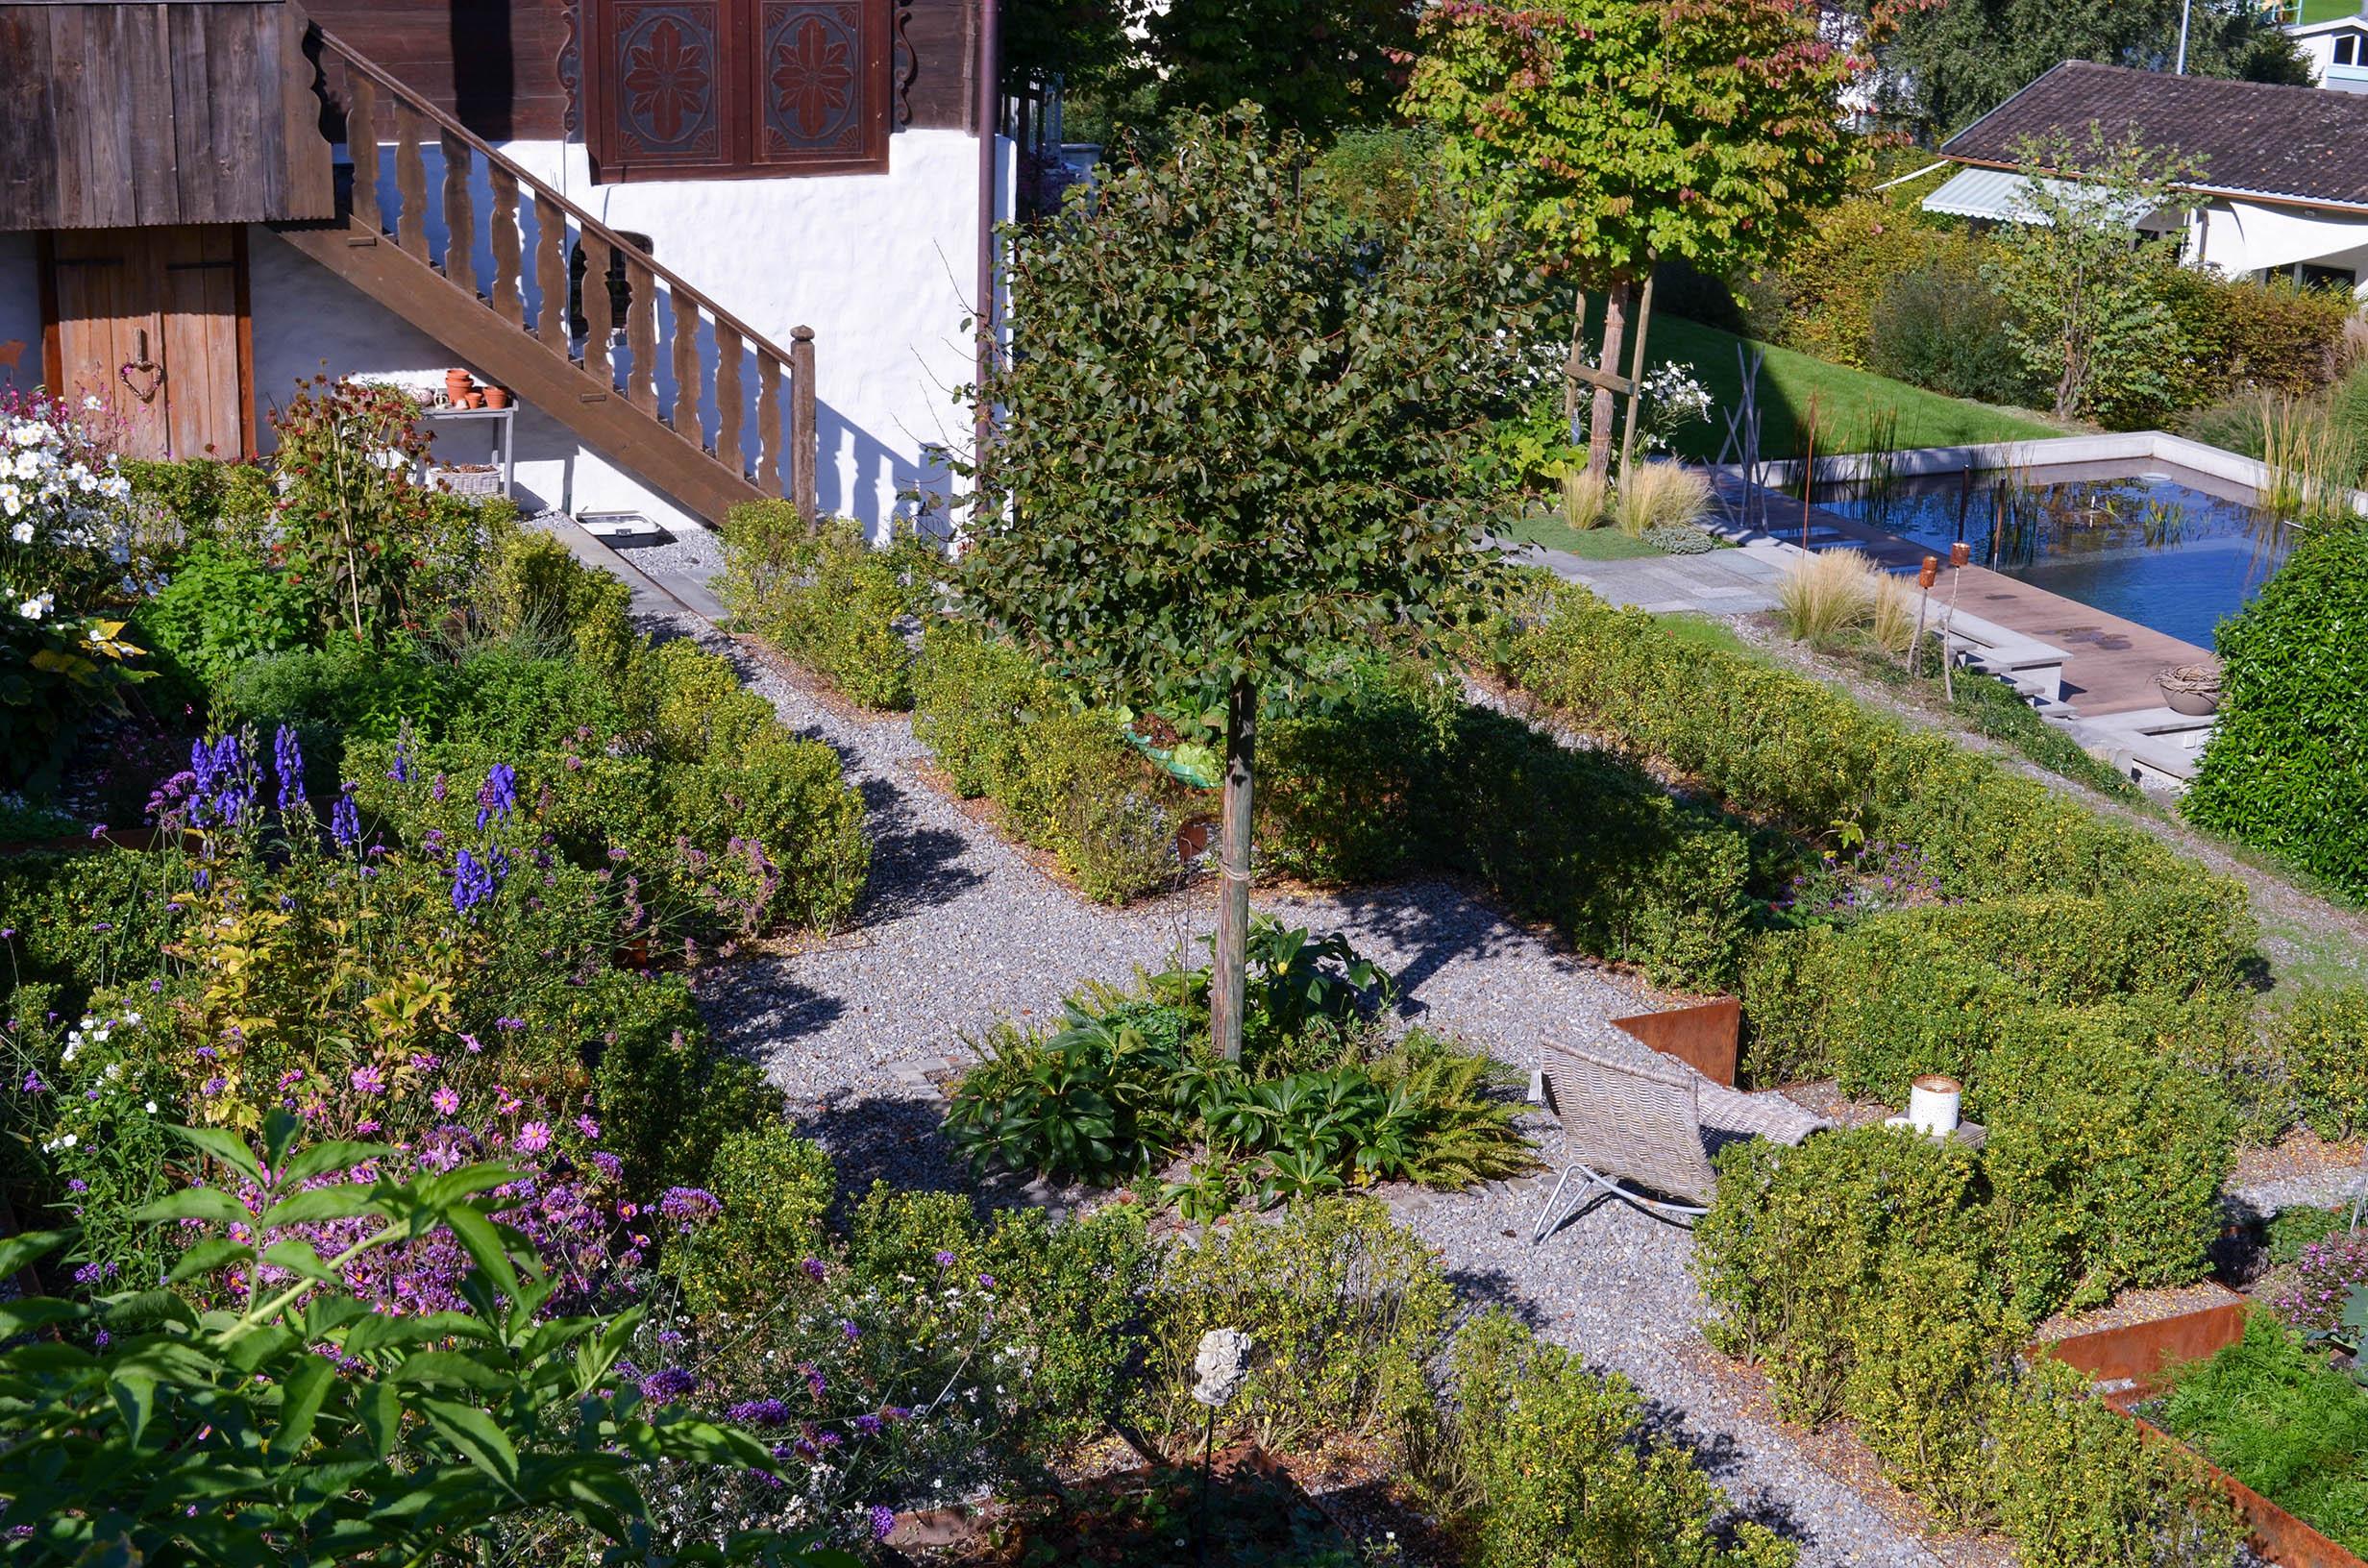 Gartenoase in Buochs 12